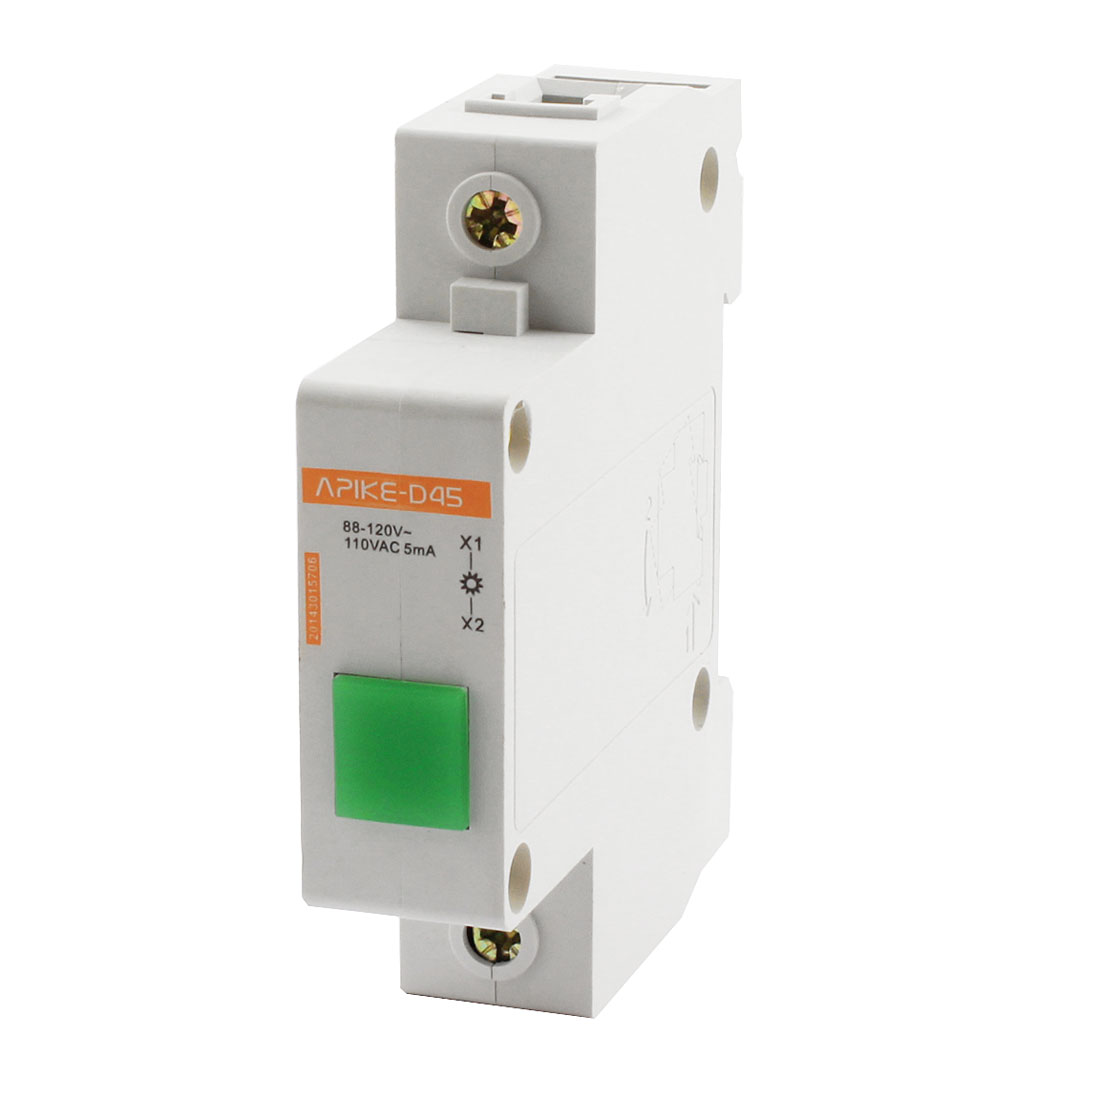 AC 110V 5mA Green LED Modular Electrical Power Signal Indicator Light Lamp